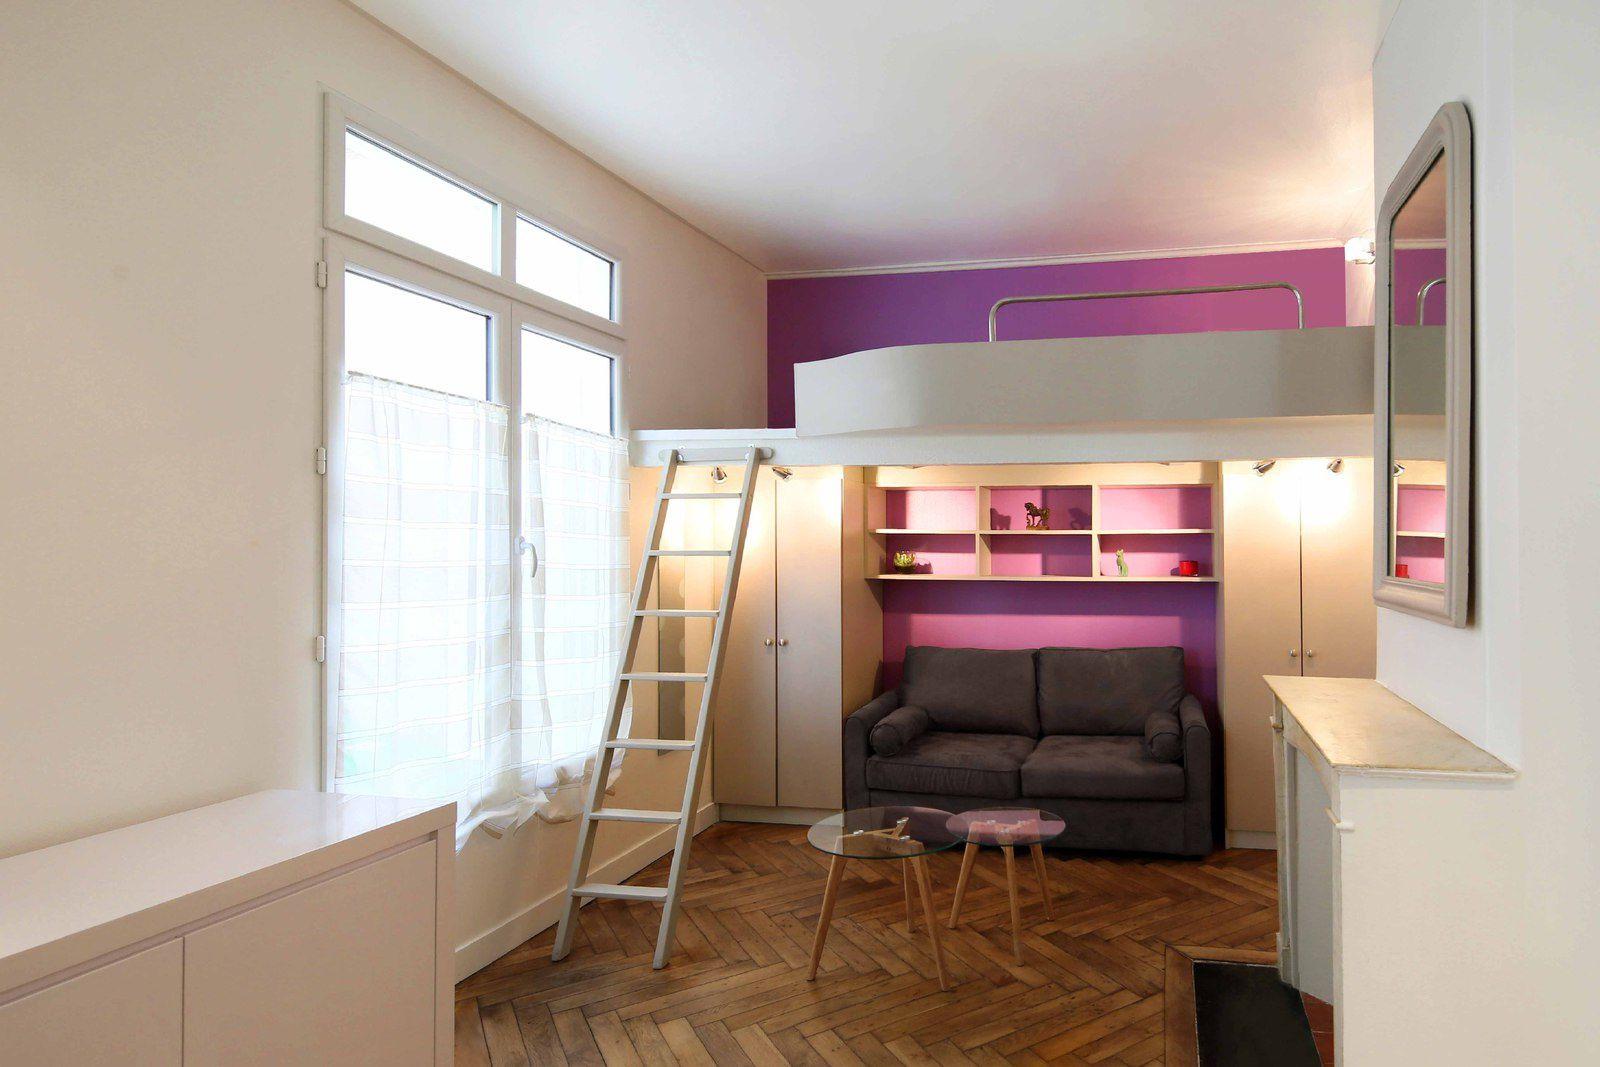 Bureau etudiant ikea chambre deco chambre ado de luxe deco